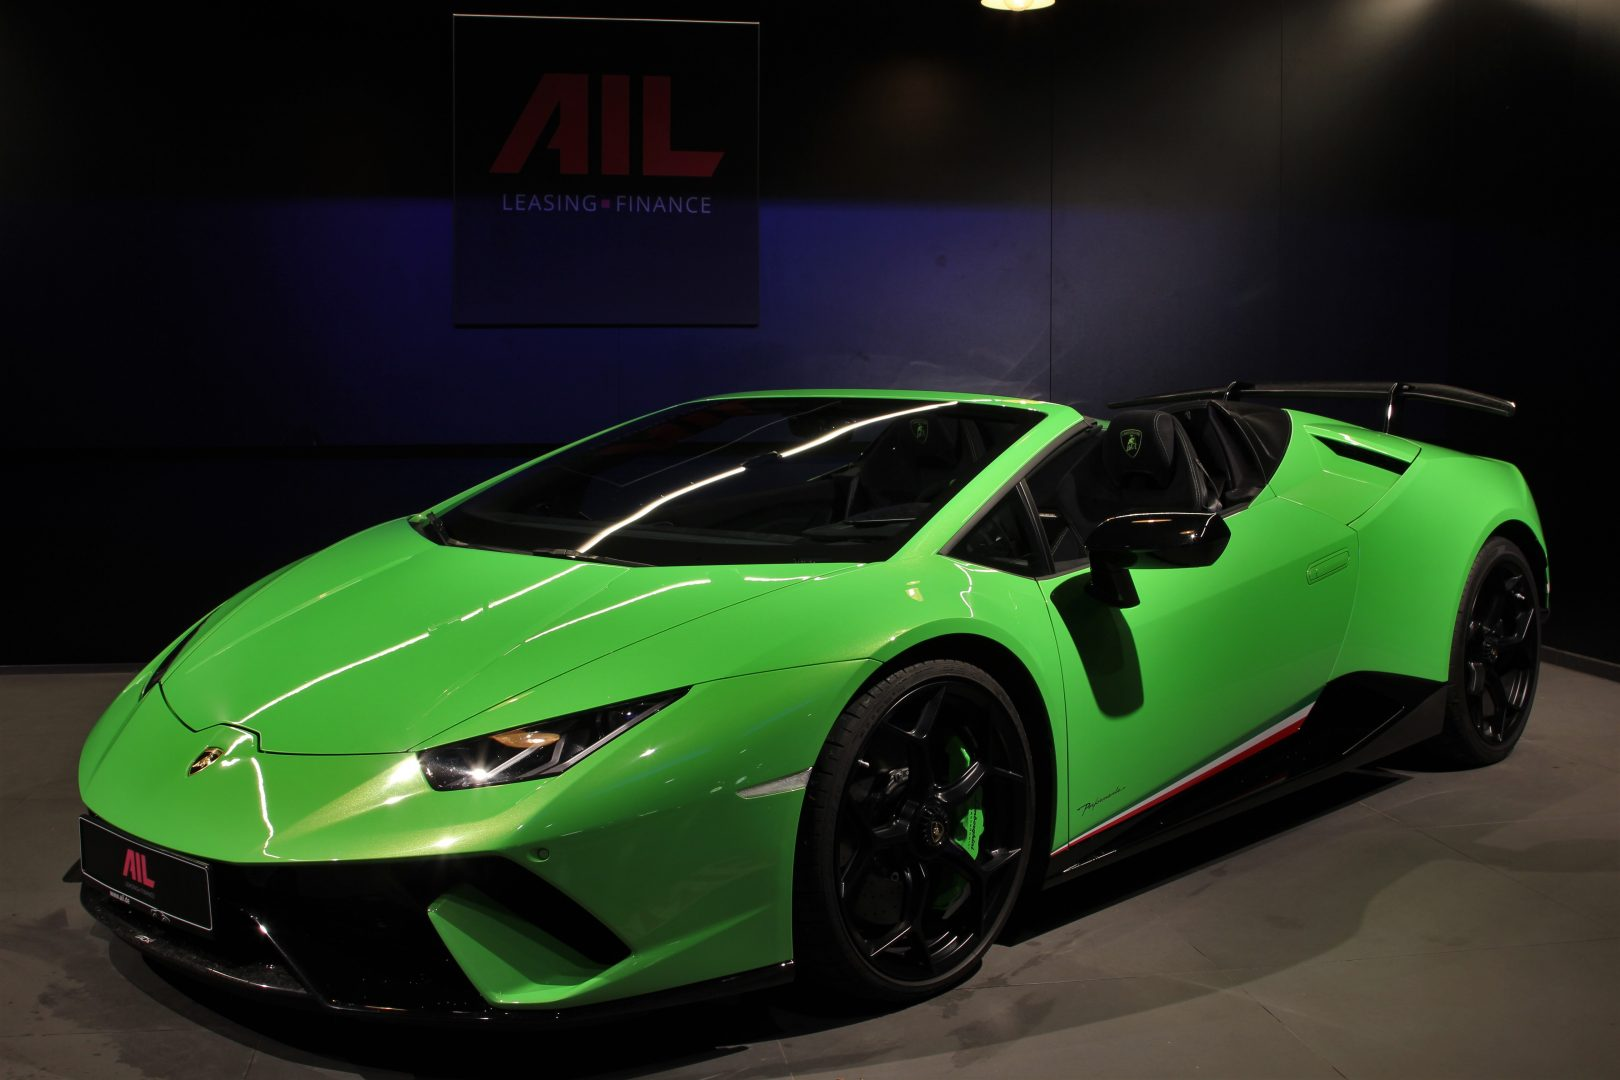 AIL Lamborghini Huracan Performante Spyder LP 640-4 15